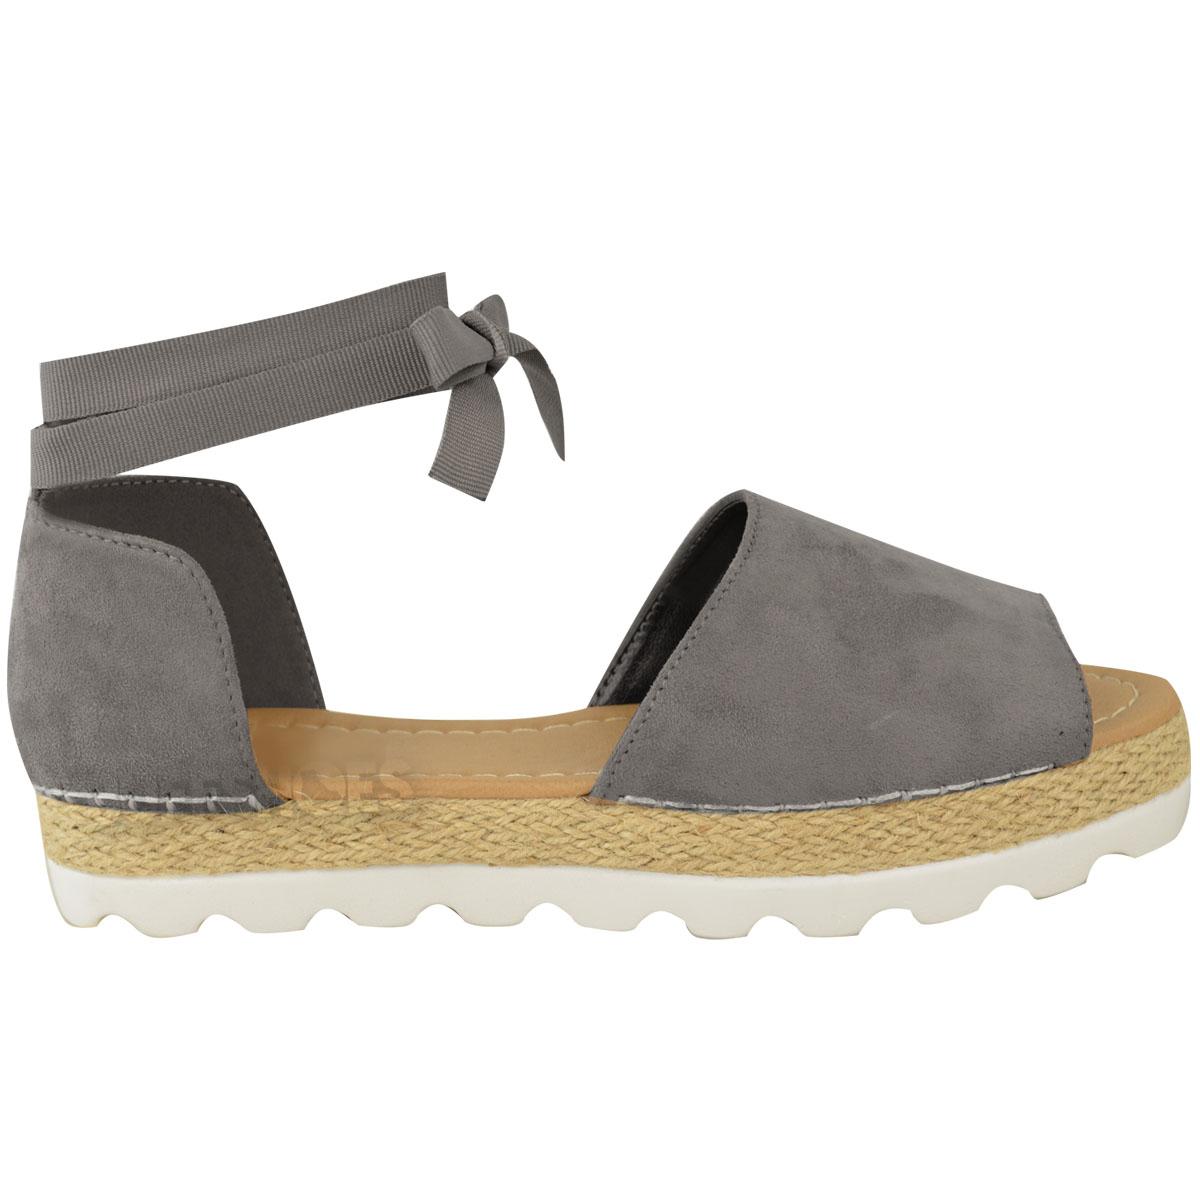 Elegant Clothes Shoes Amp Accessories Gt Women39s Shoes Gt Other Women39